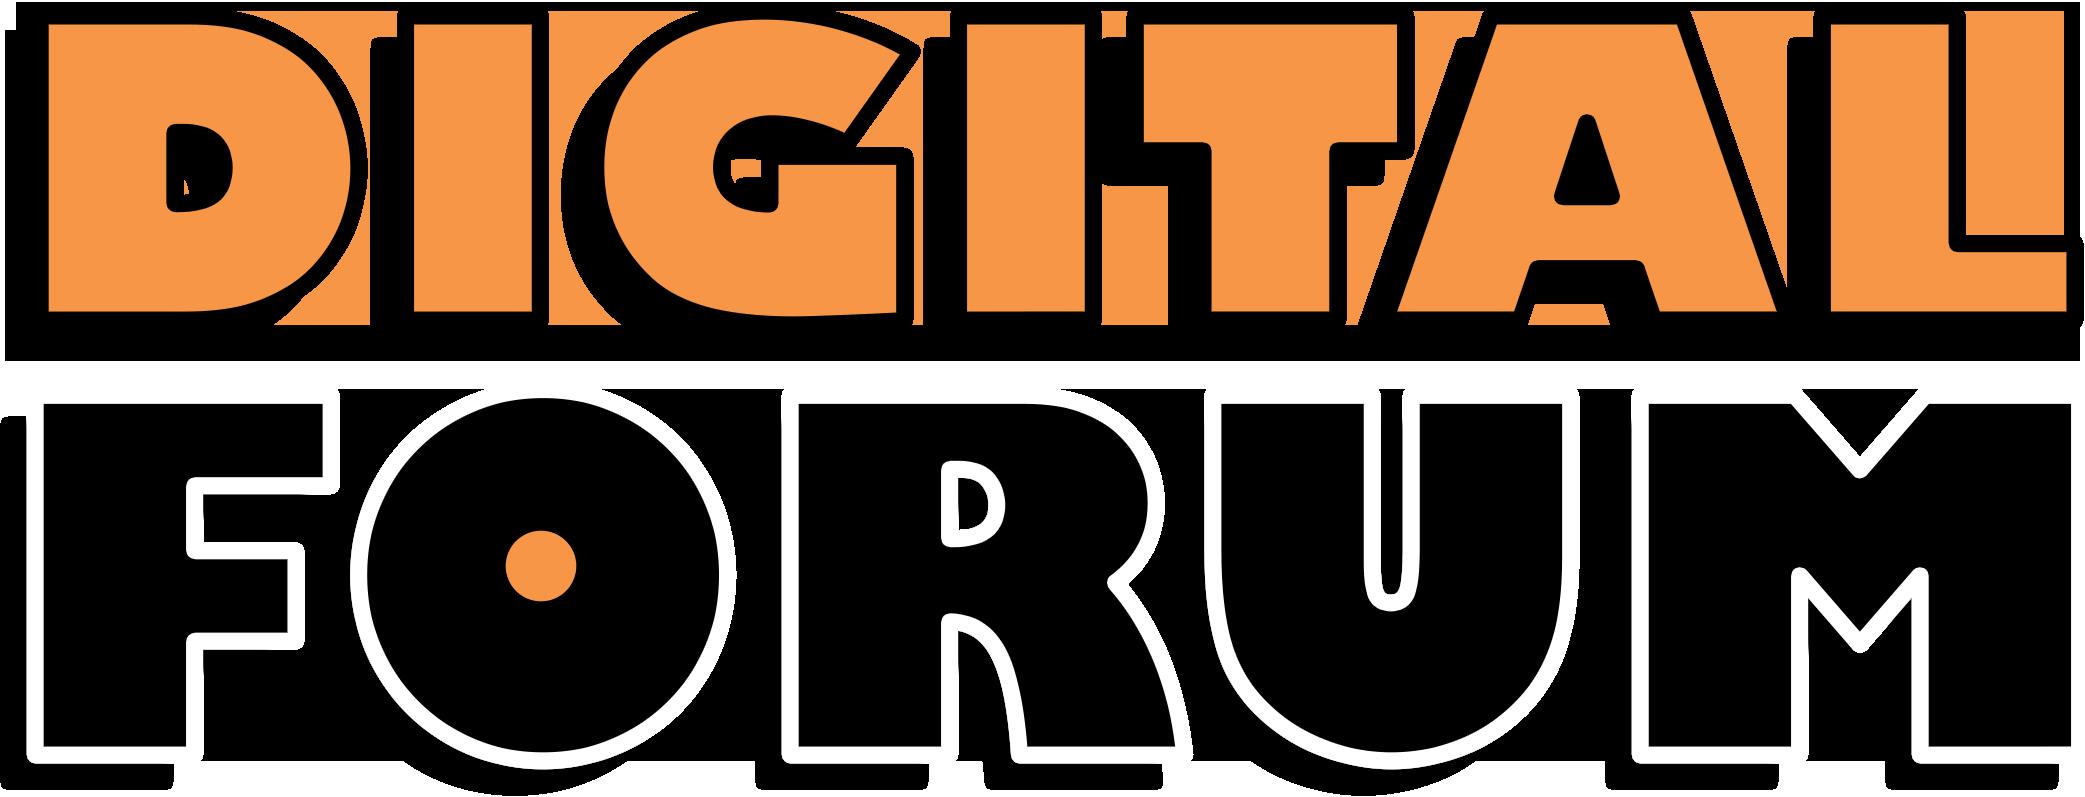 Clipart calendar october 2016 clipart black and white stock Digital Forum 5th October 2016 - Contrado Digital clipart black and white stock